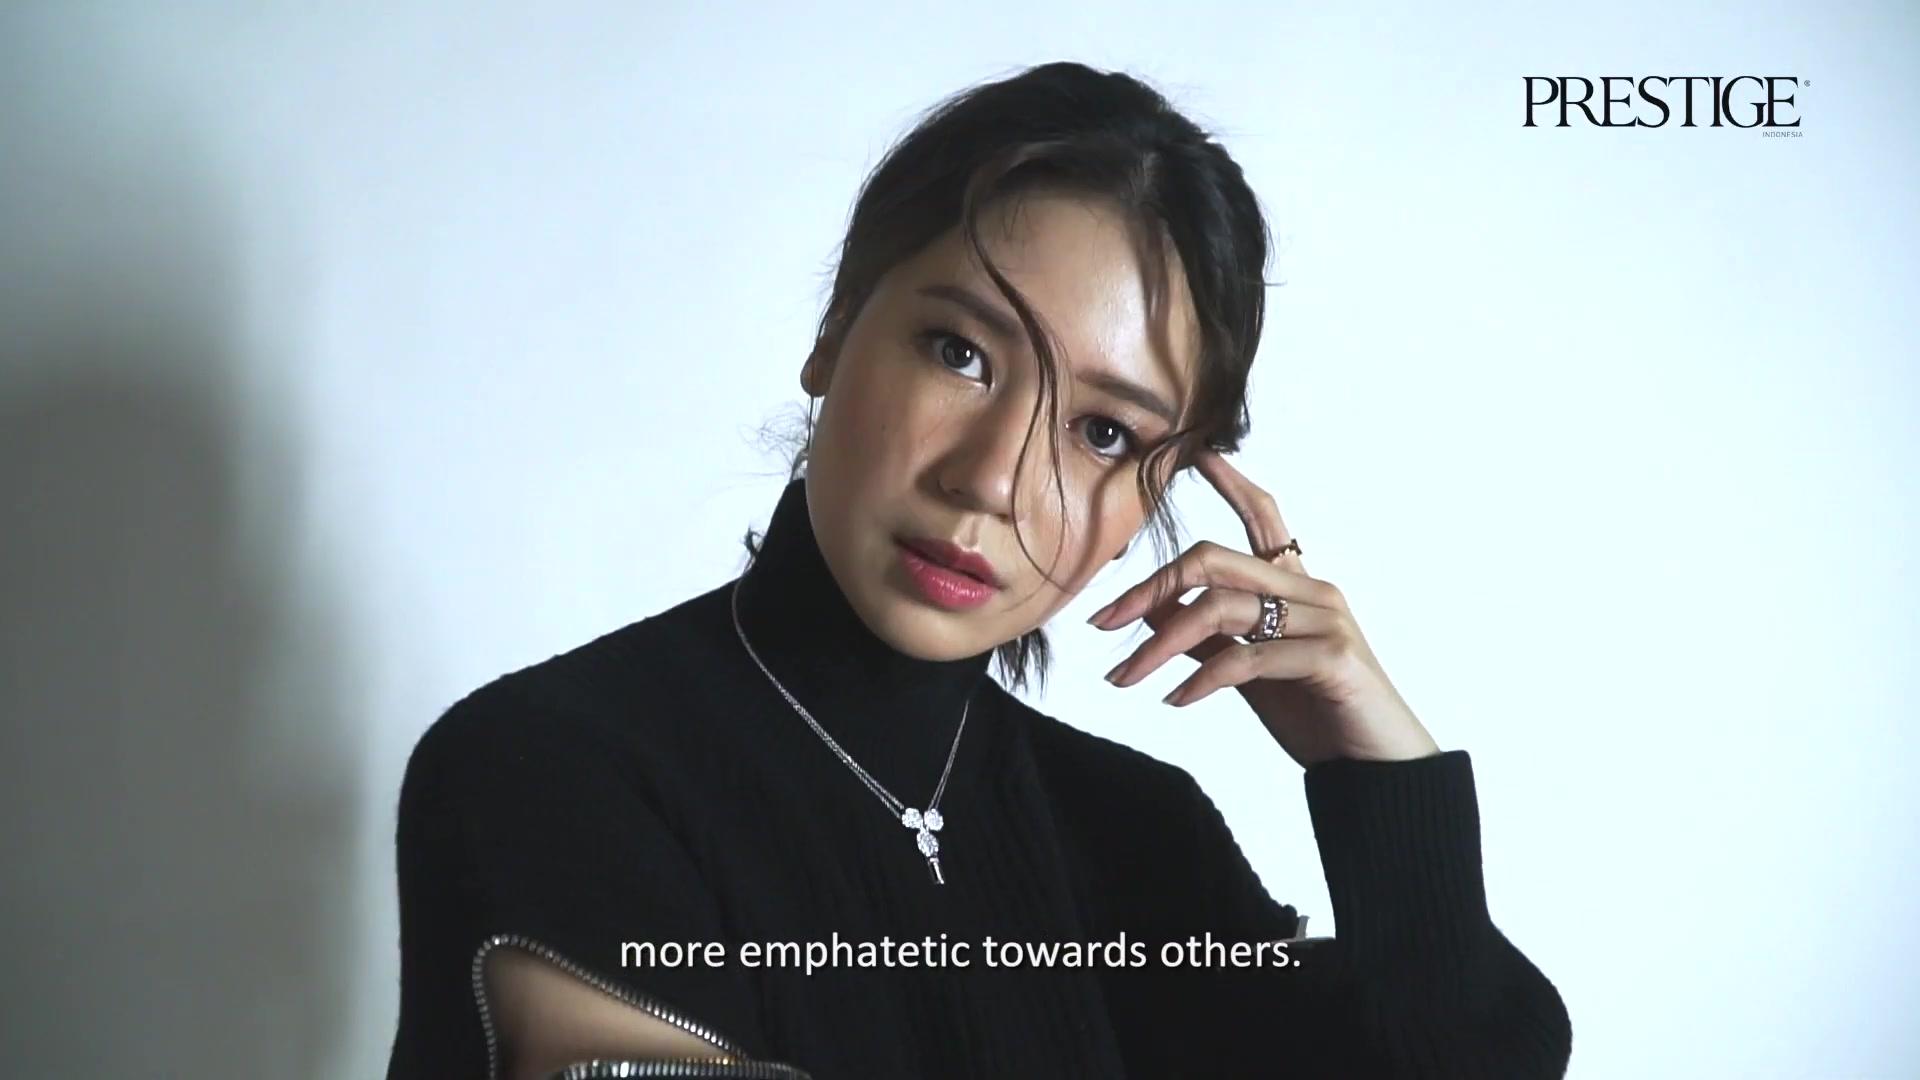 Celebrity Hairstyle Of Laura Basuki From Photoshoot Prestige Indonesia 2019 Charmboard